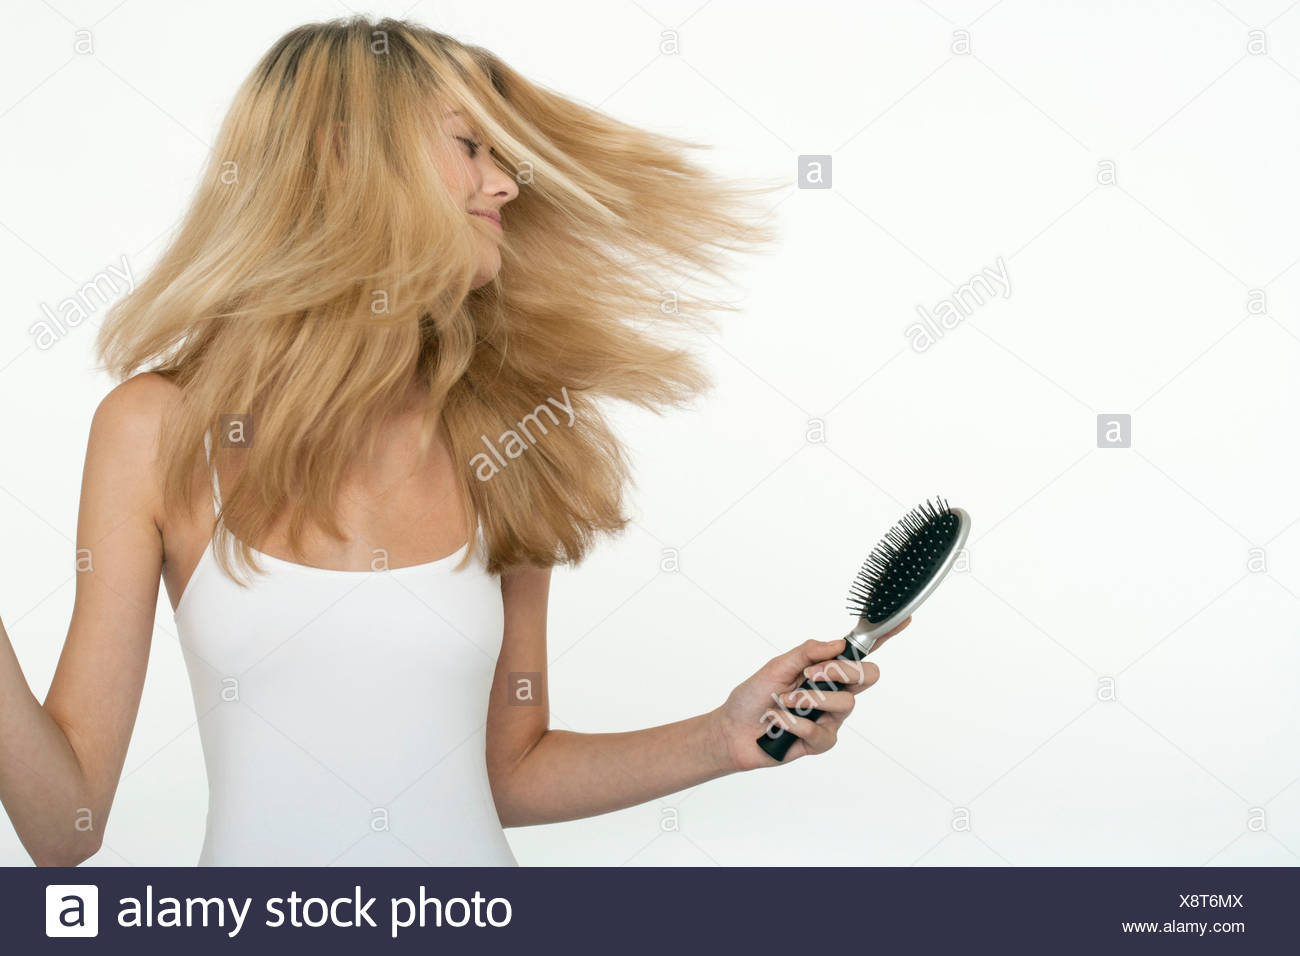 Teen girl tossing her hair - Stock Image